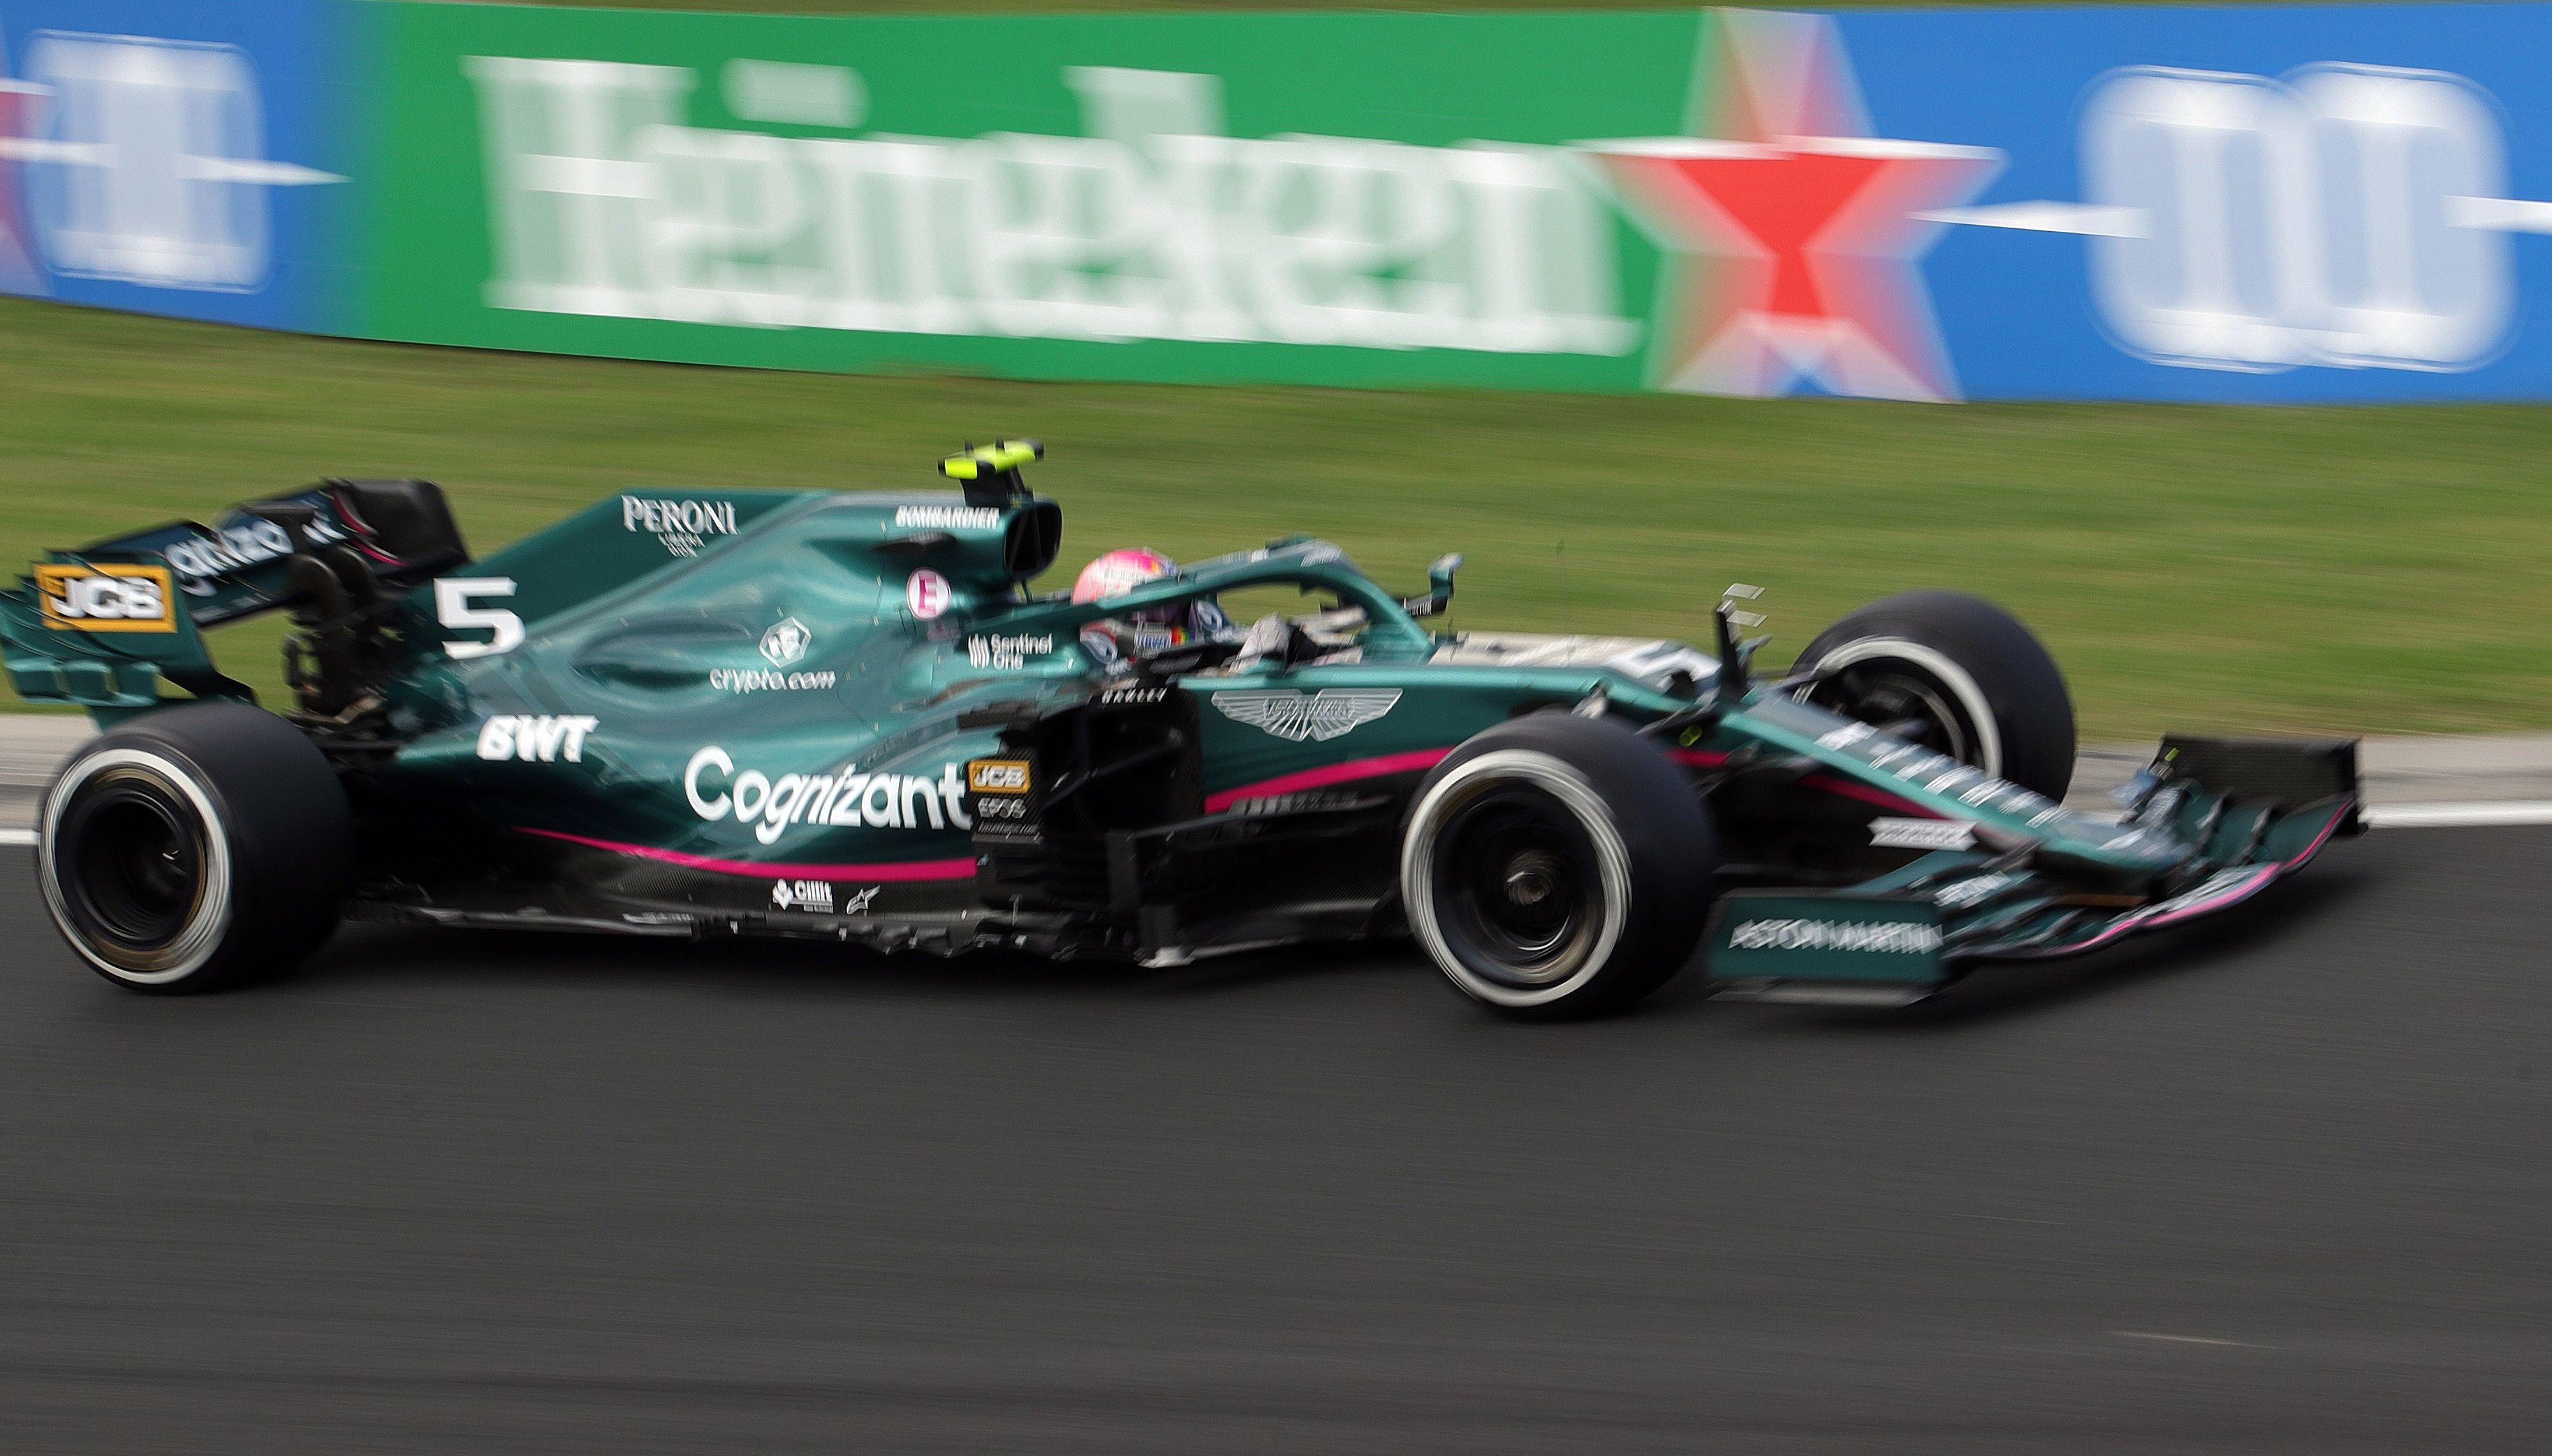 Aston Martin entró este año en la F1 como equipo íntegro y tiene a Sebastian Vettel como baluarte (REUTERS/Florion Goga)